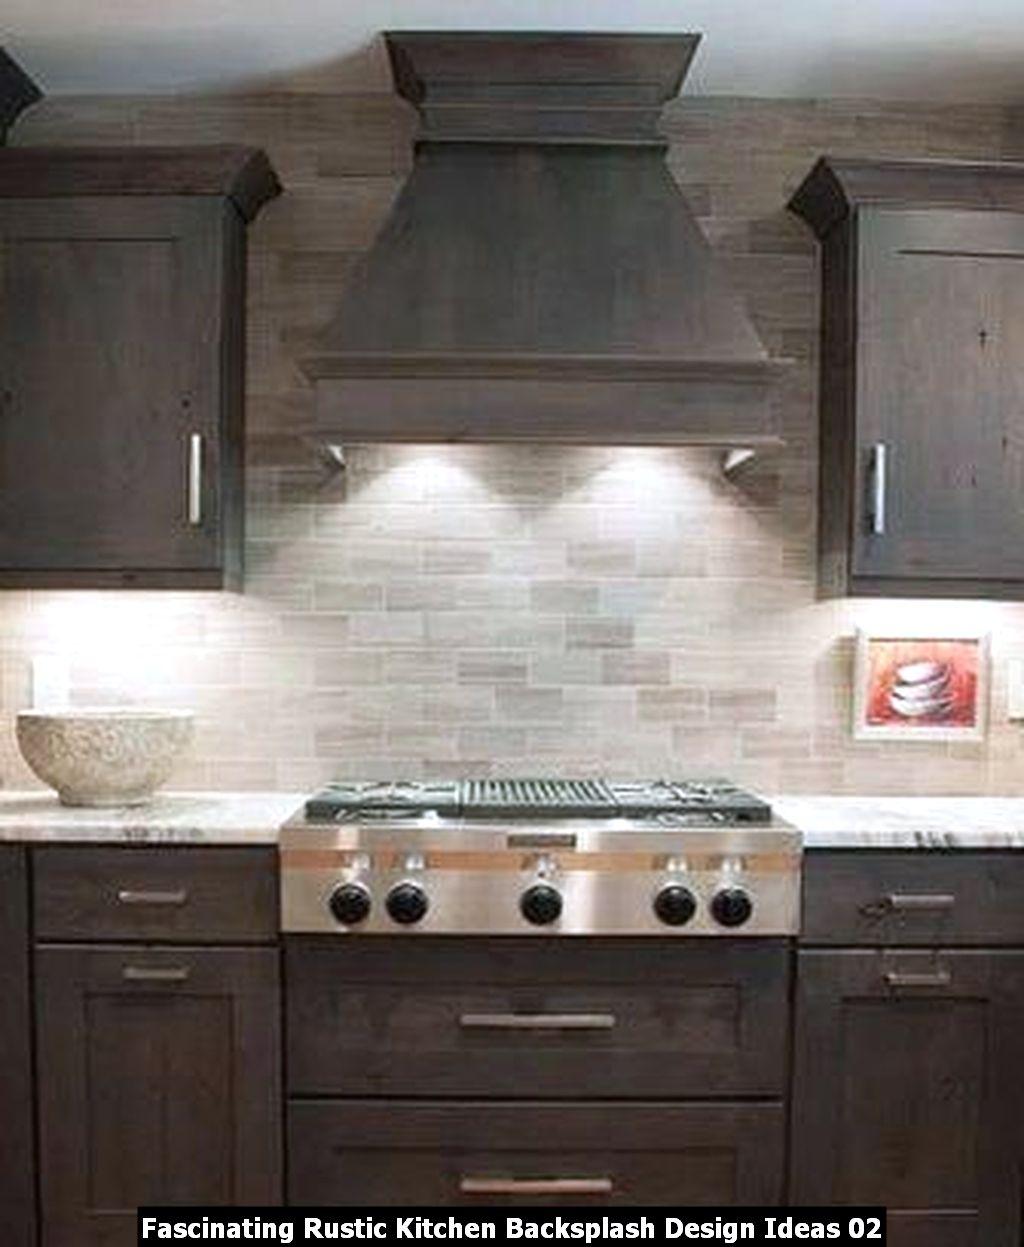 Fascinating Rustic Kitchen Backsplash Design Ideas 02